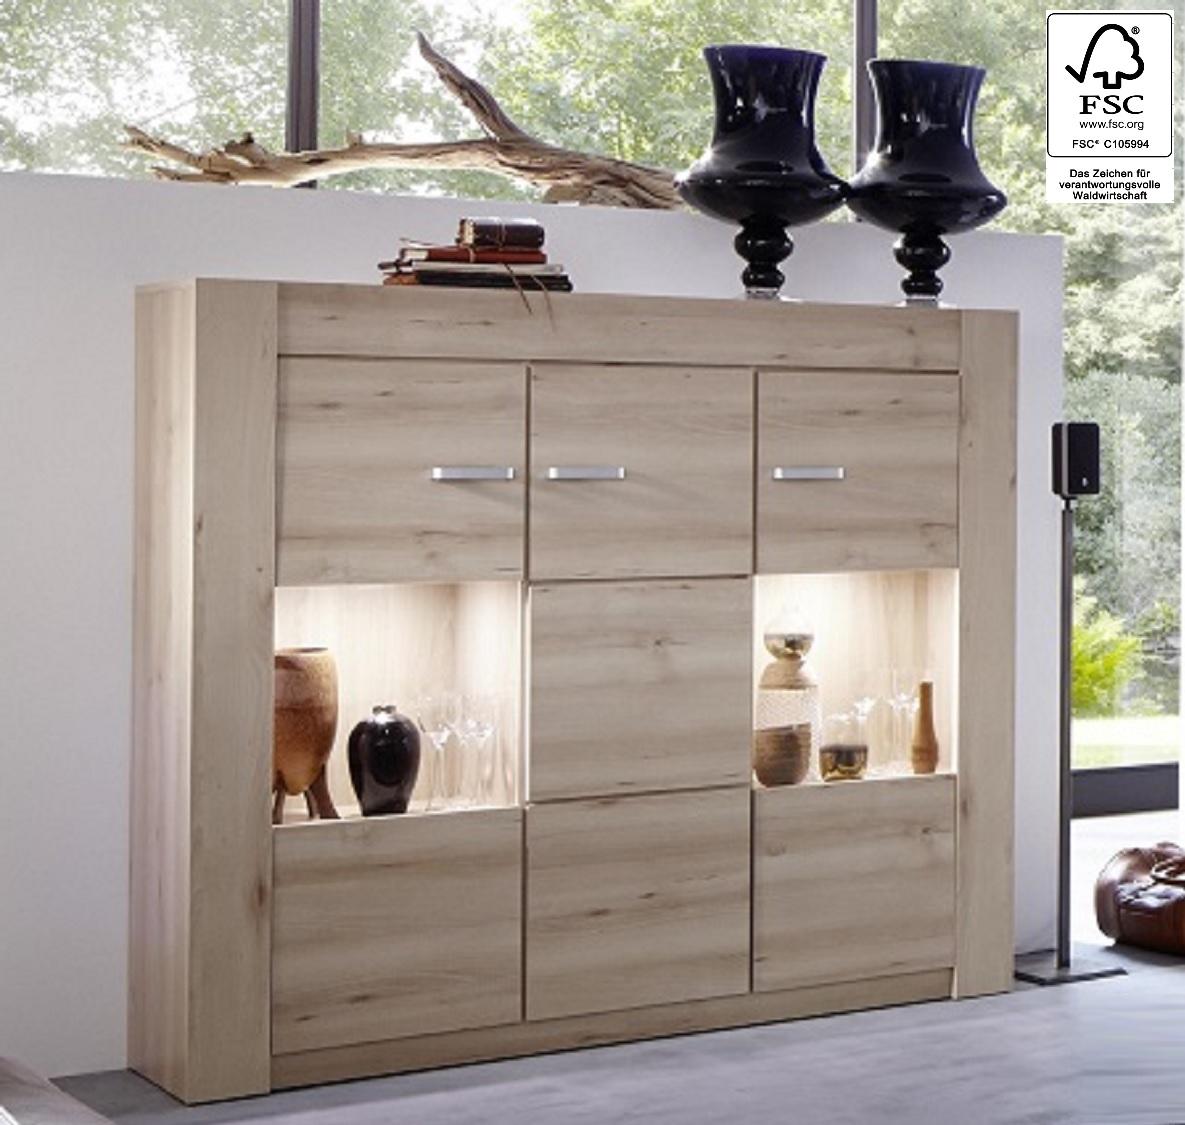 sideboard novara edel buche natur 152 x 142 cm fsc. Black Bedroom Furniture Sets. Home Design Ideas